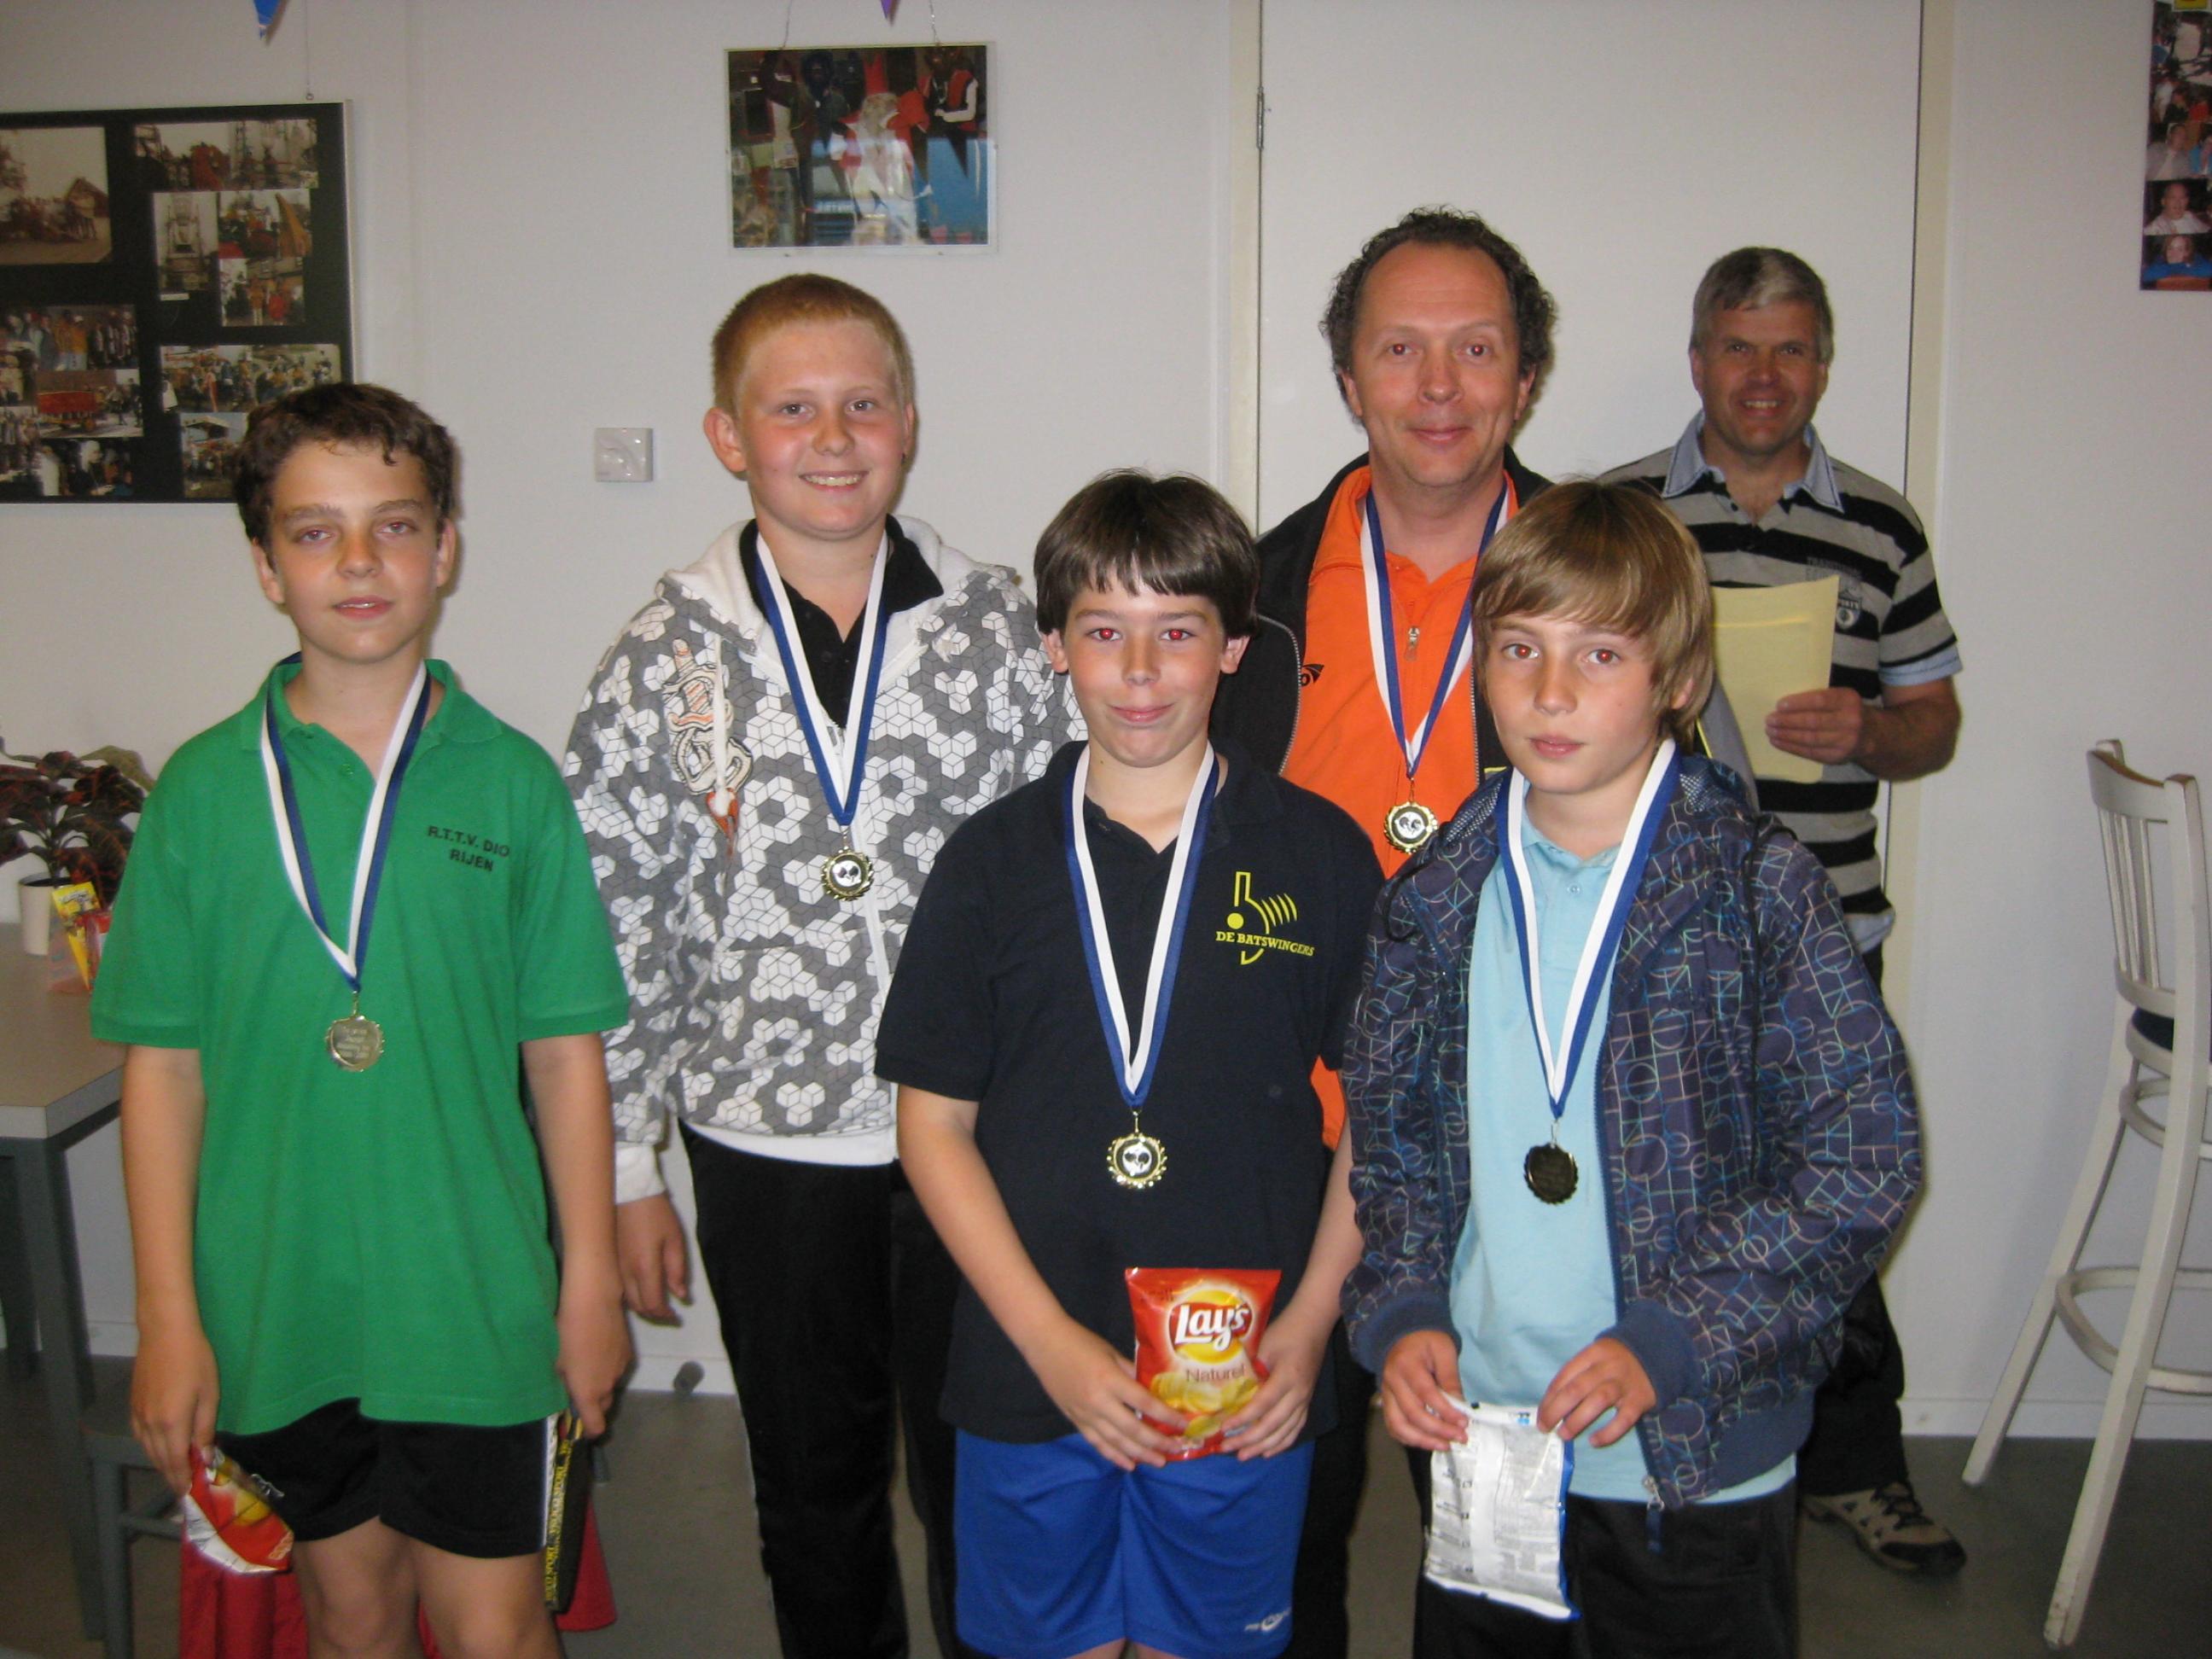 winnende team op jeugddag 2010